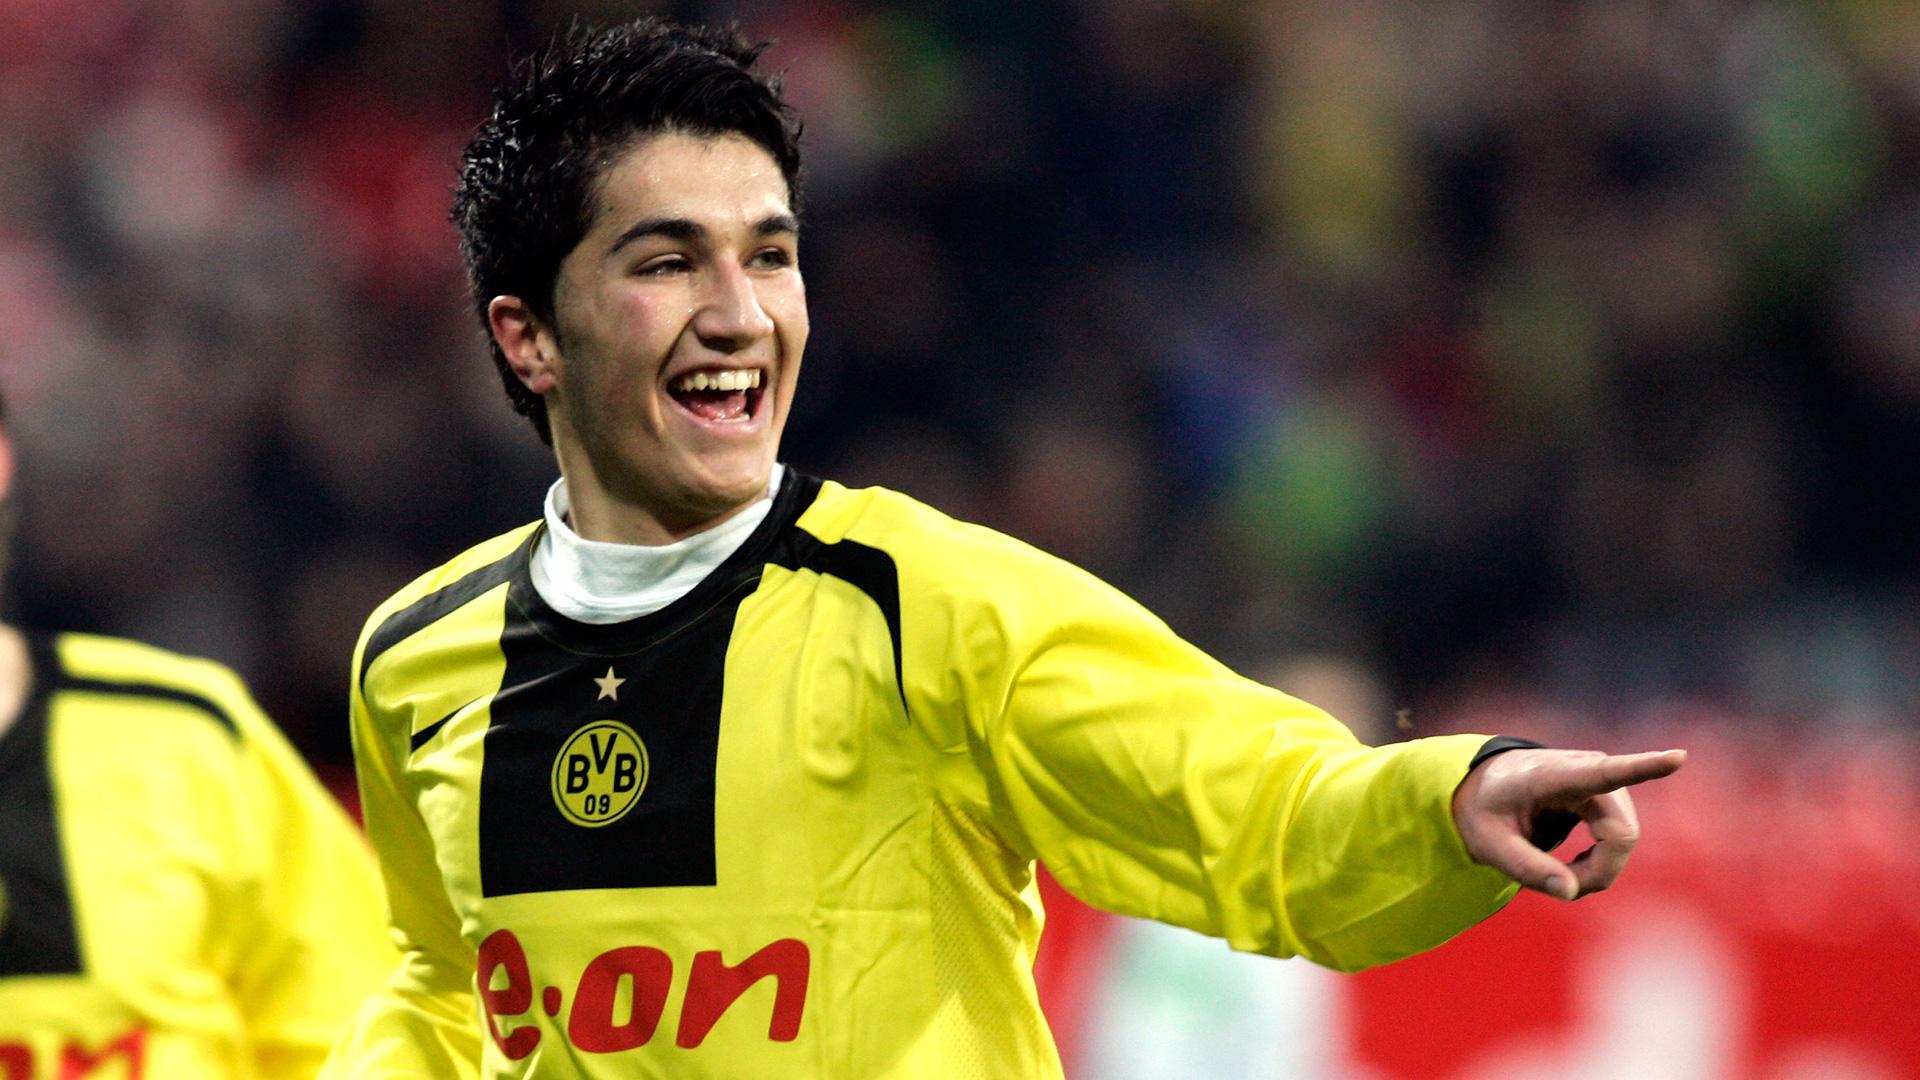 Nuri Sahin Borussia Dortmund 2005